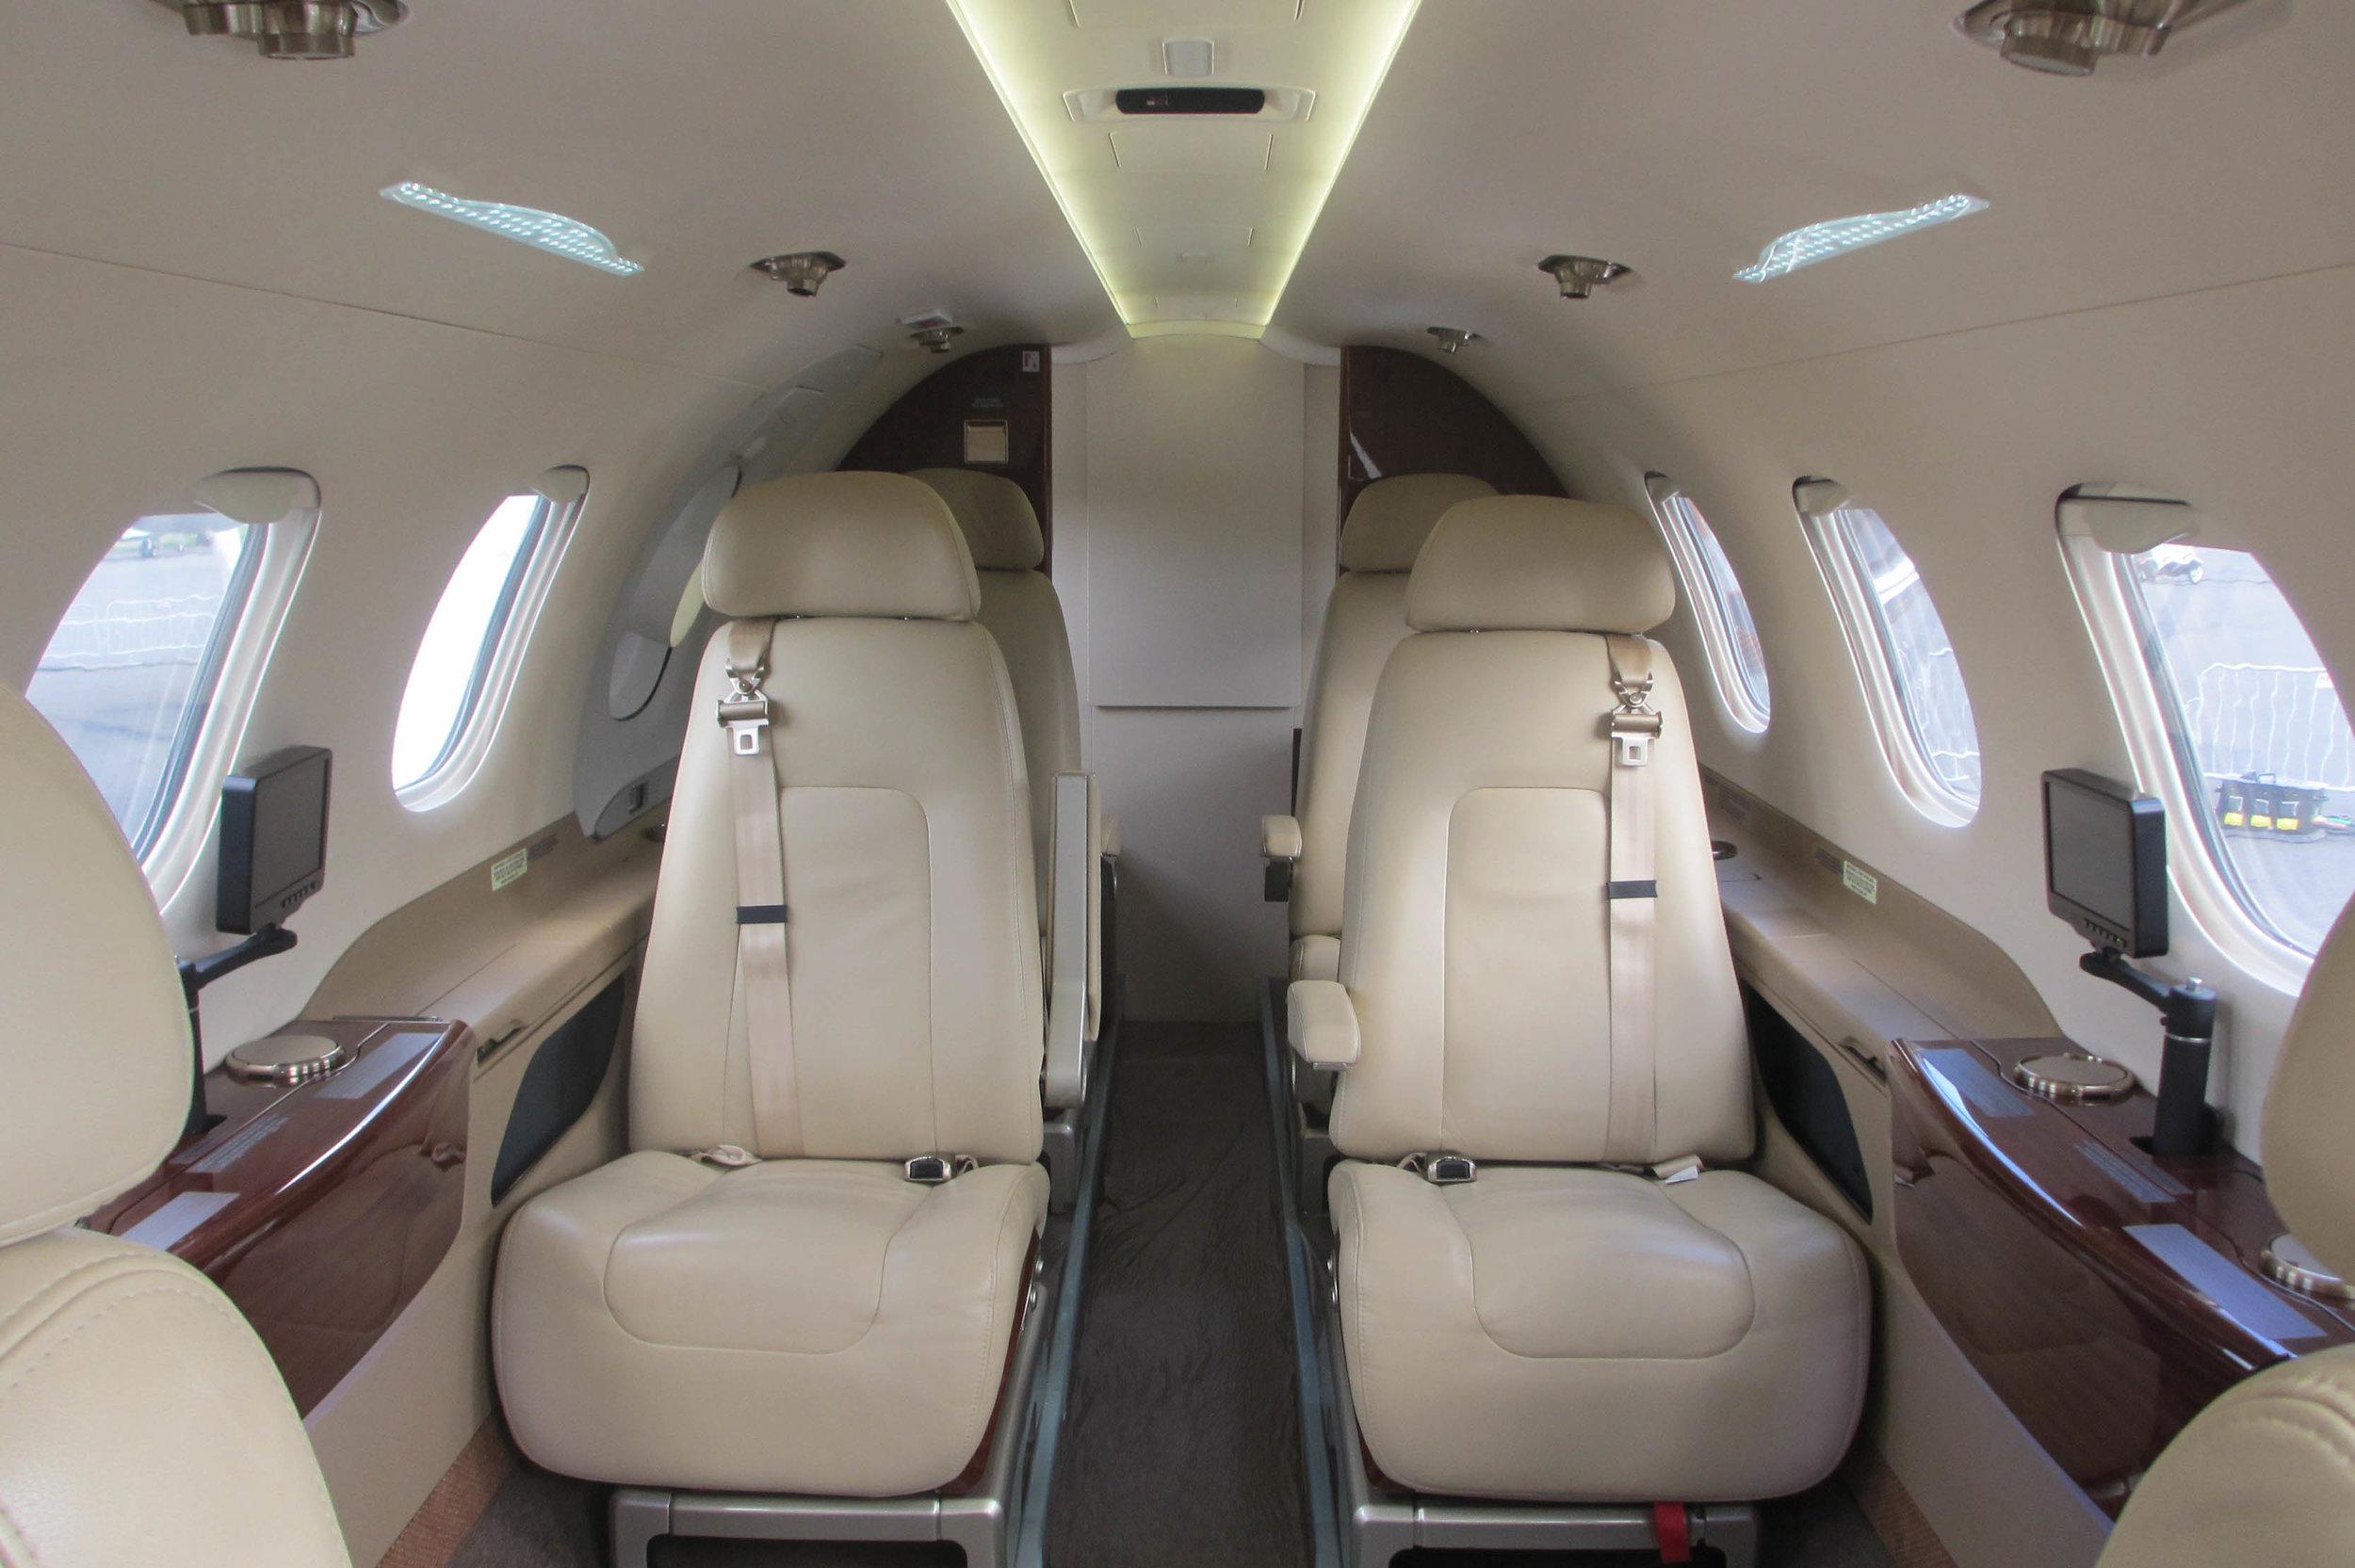 Interior of an Embraer Phenom 300 light jet. Above banner: Bombardier LearJet 45.